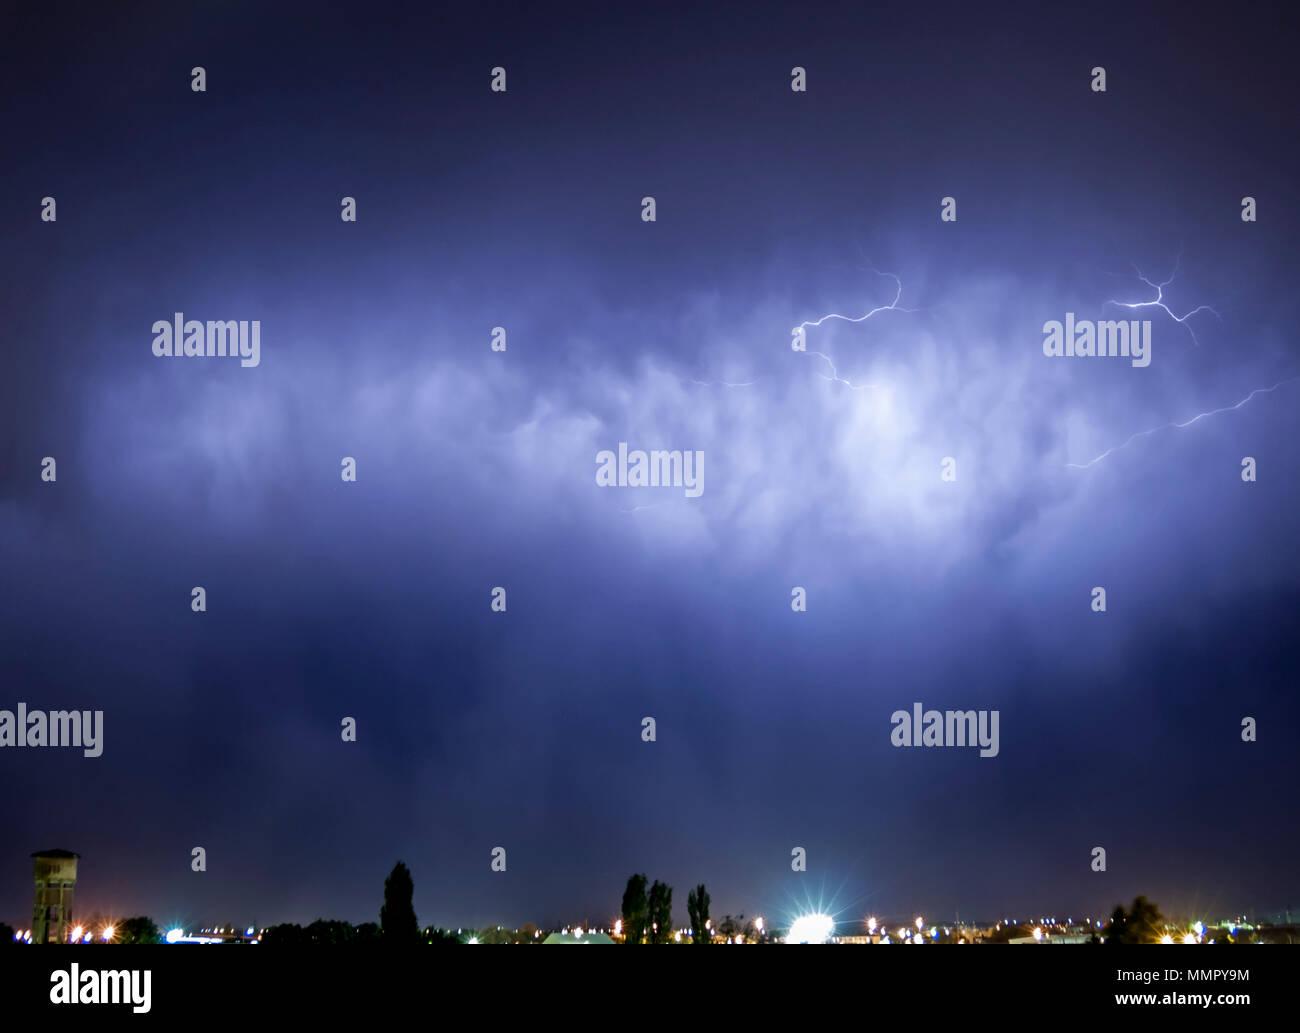 Lightning flash over a city, Thunderstorm , electricity blast storm Stock Photo